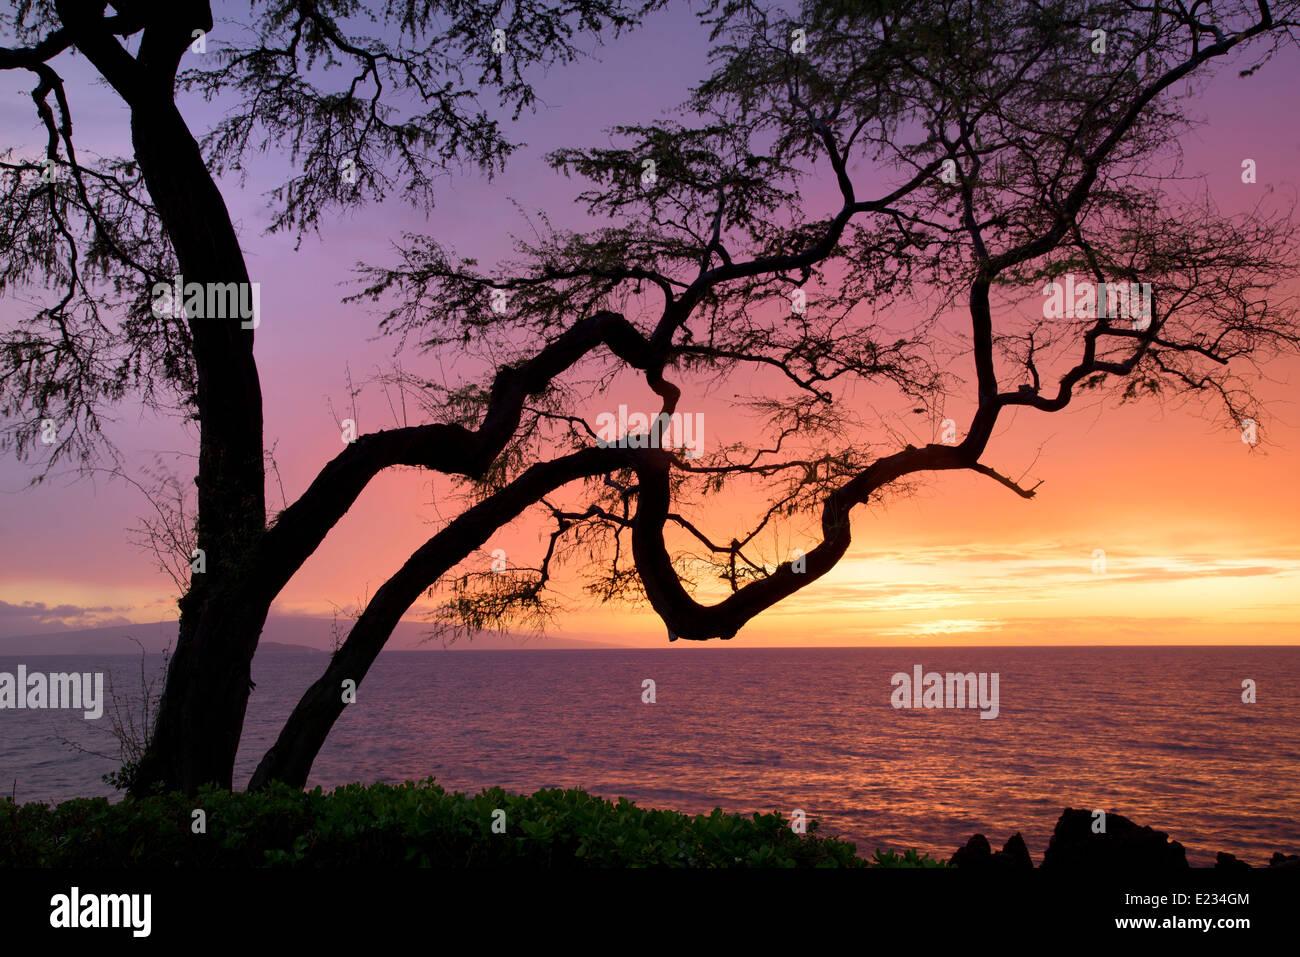 Branching tree and sunset. Maui, Hawaii. - Stock Image